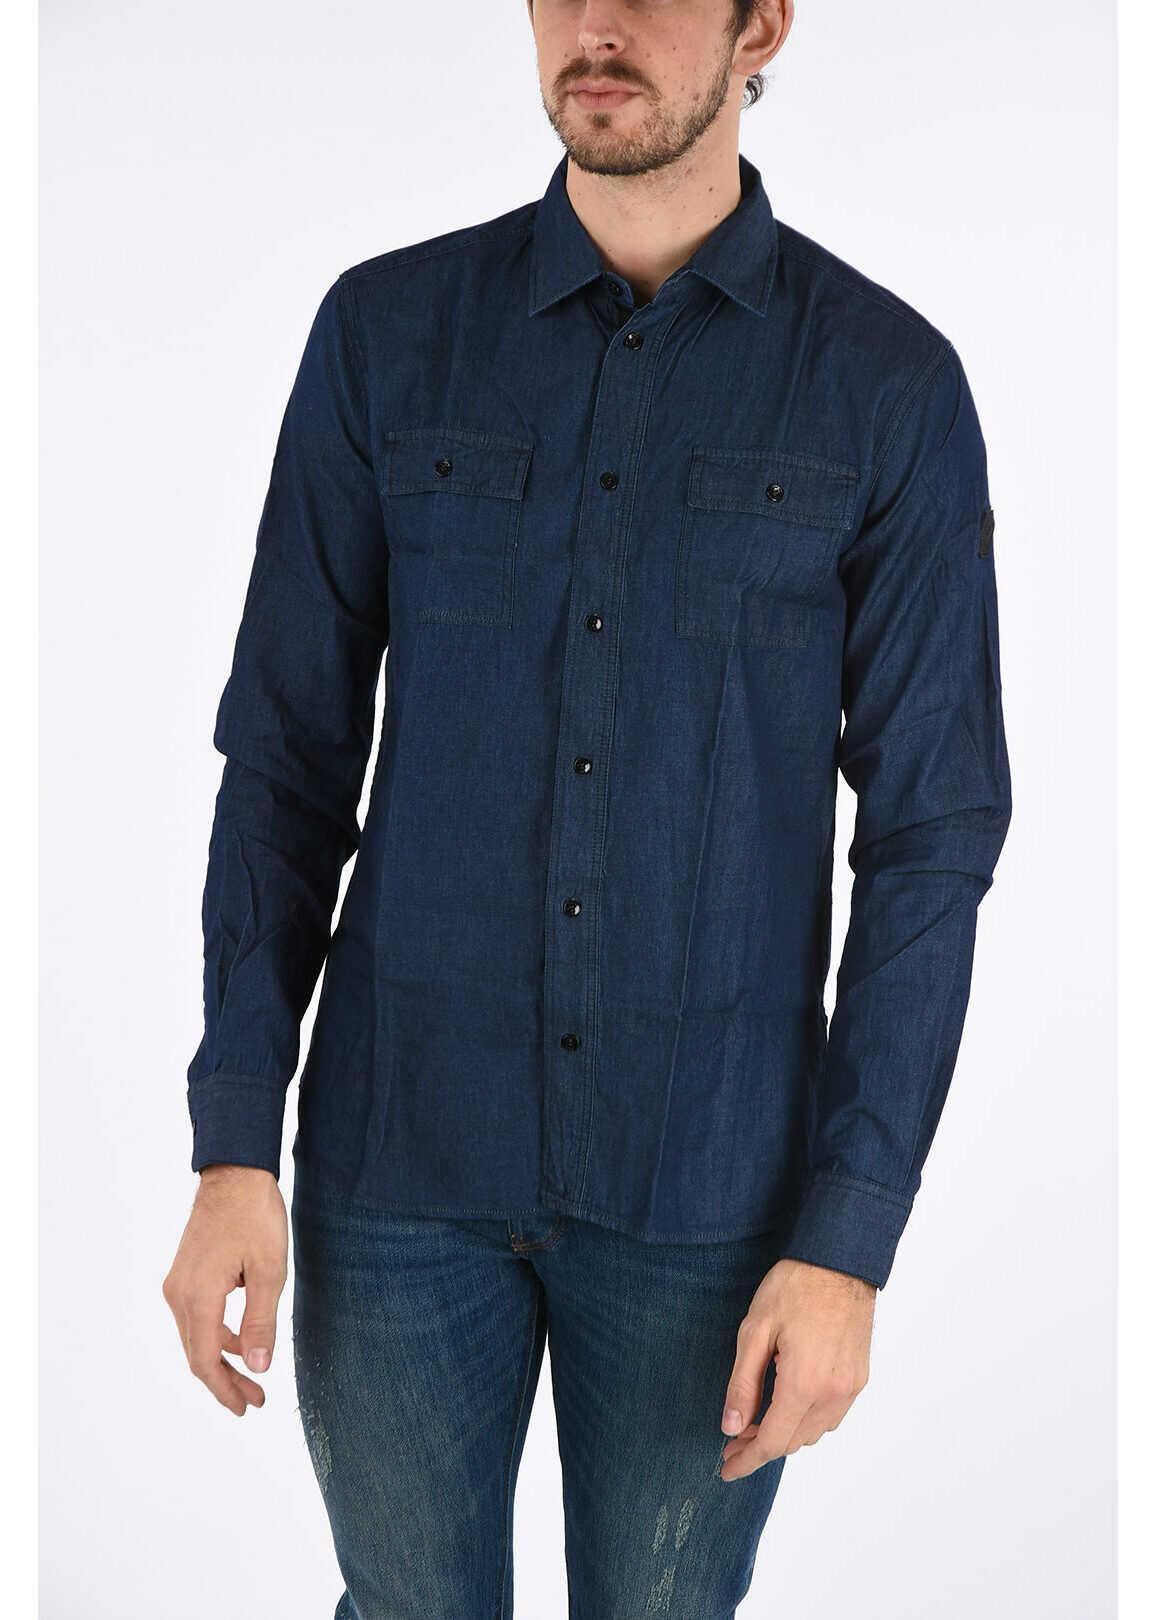 Armani ARMANI JEANS Spread Collar Denim Shirt BLUE imagine